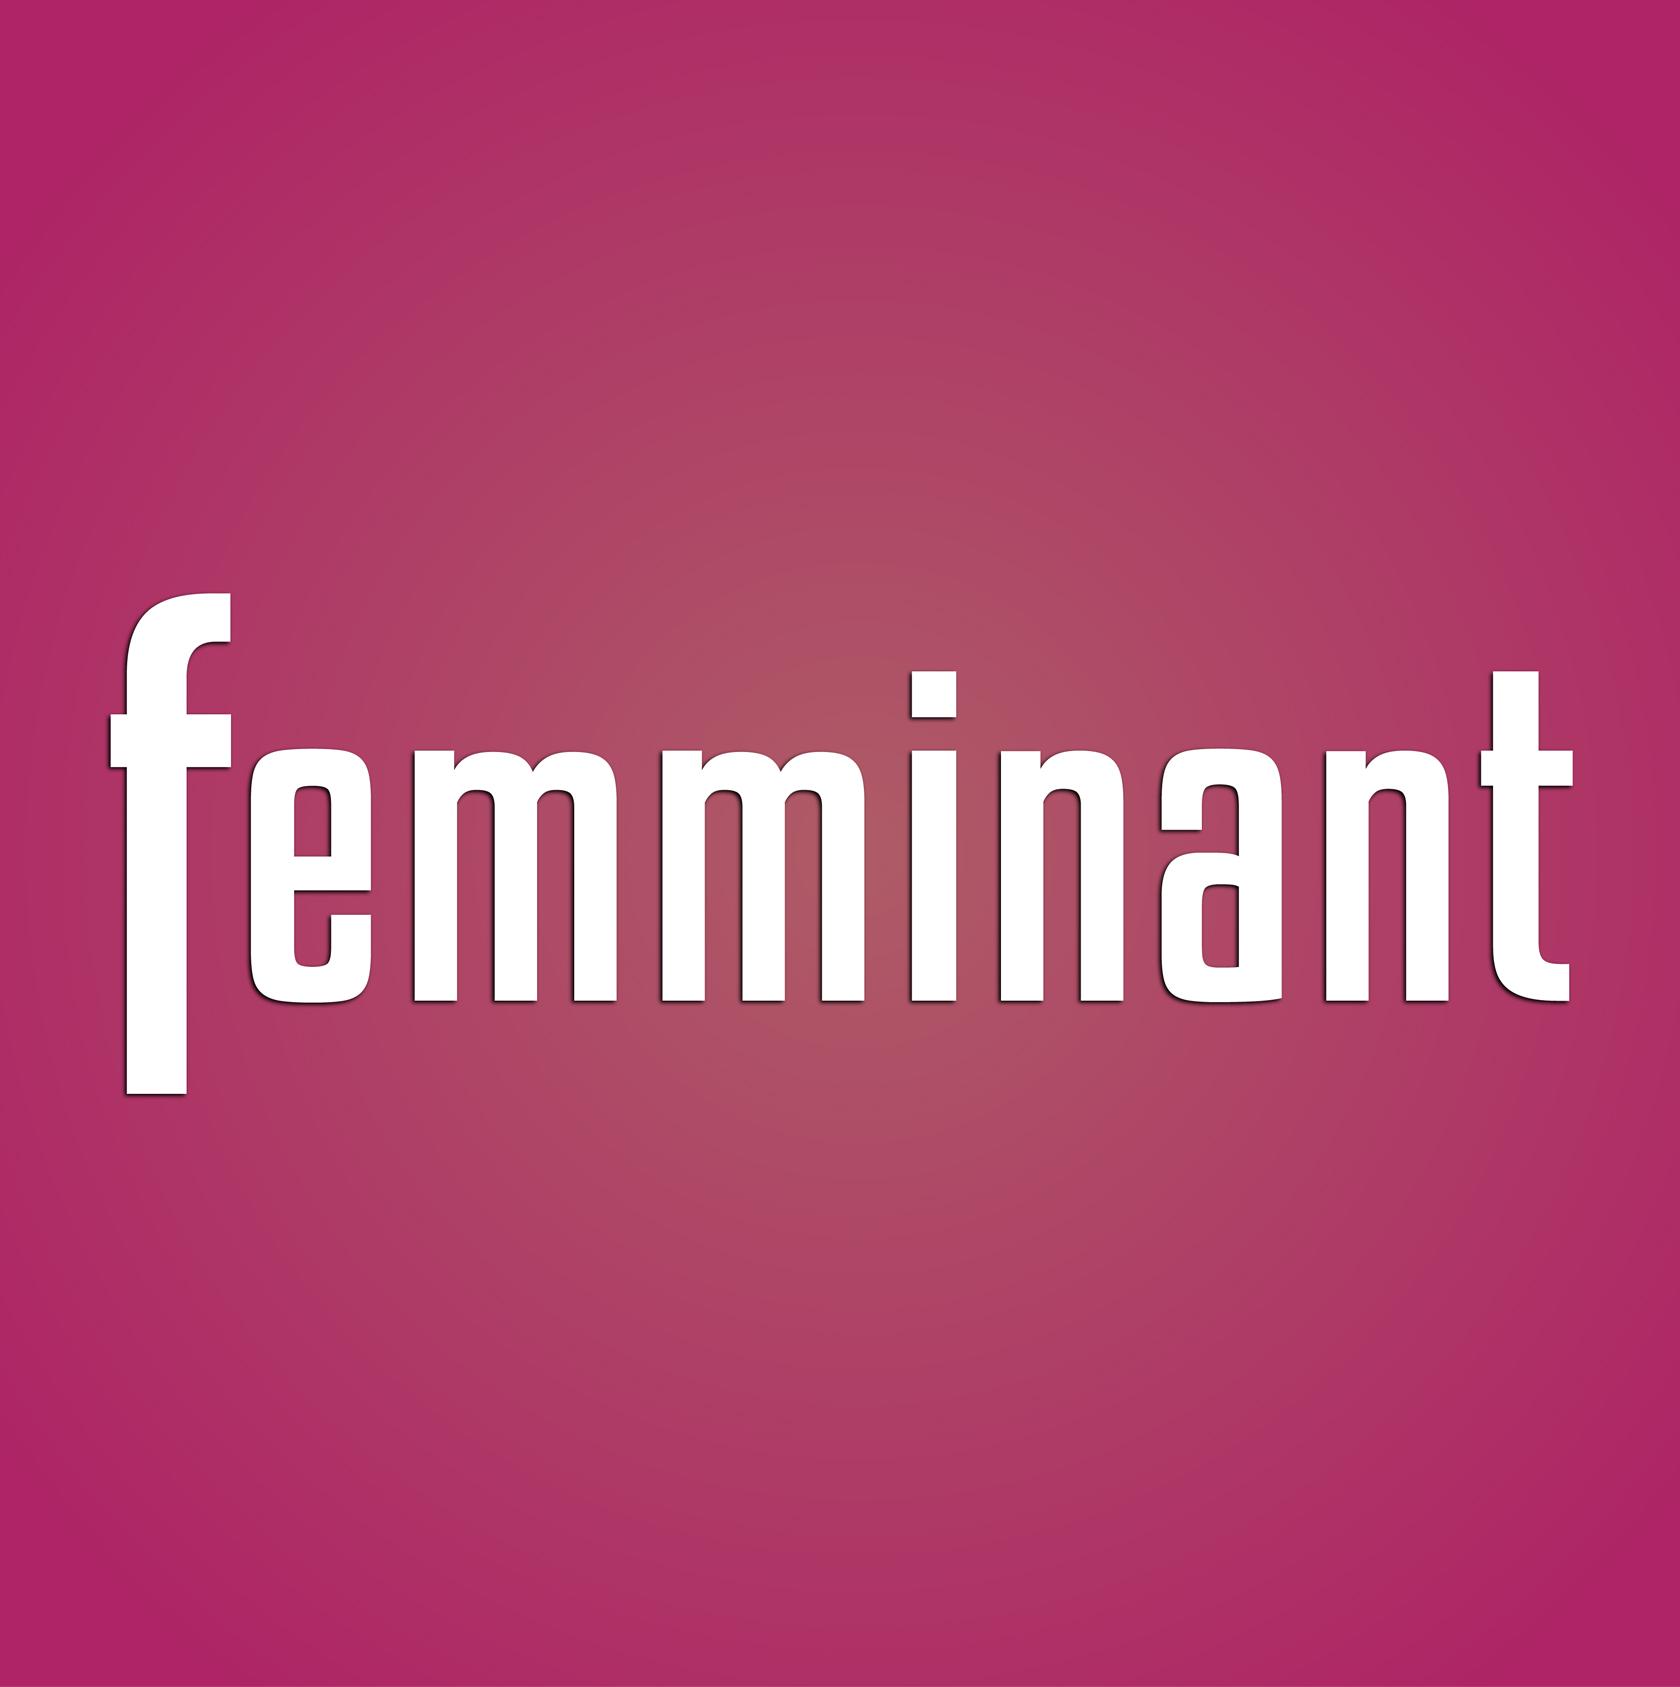 Femminant-Cuadrado-1680